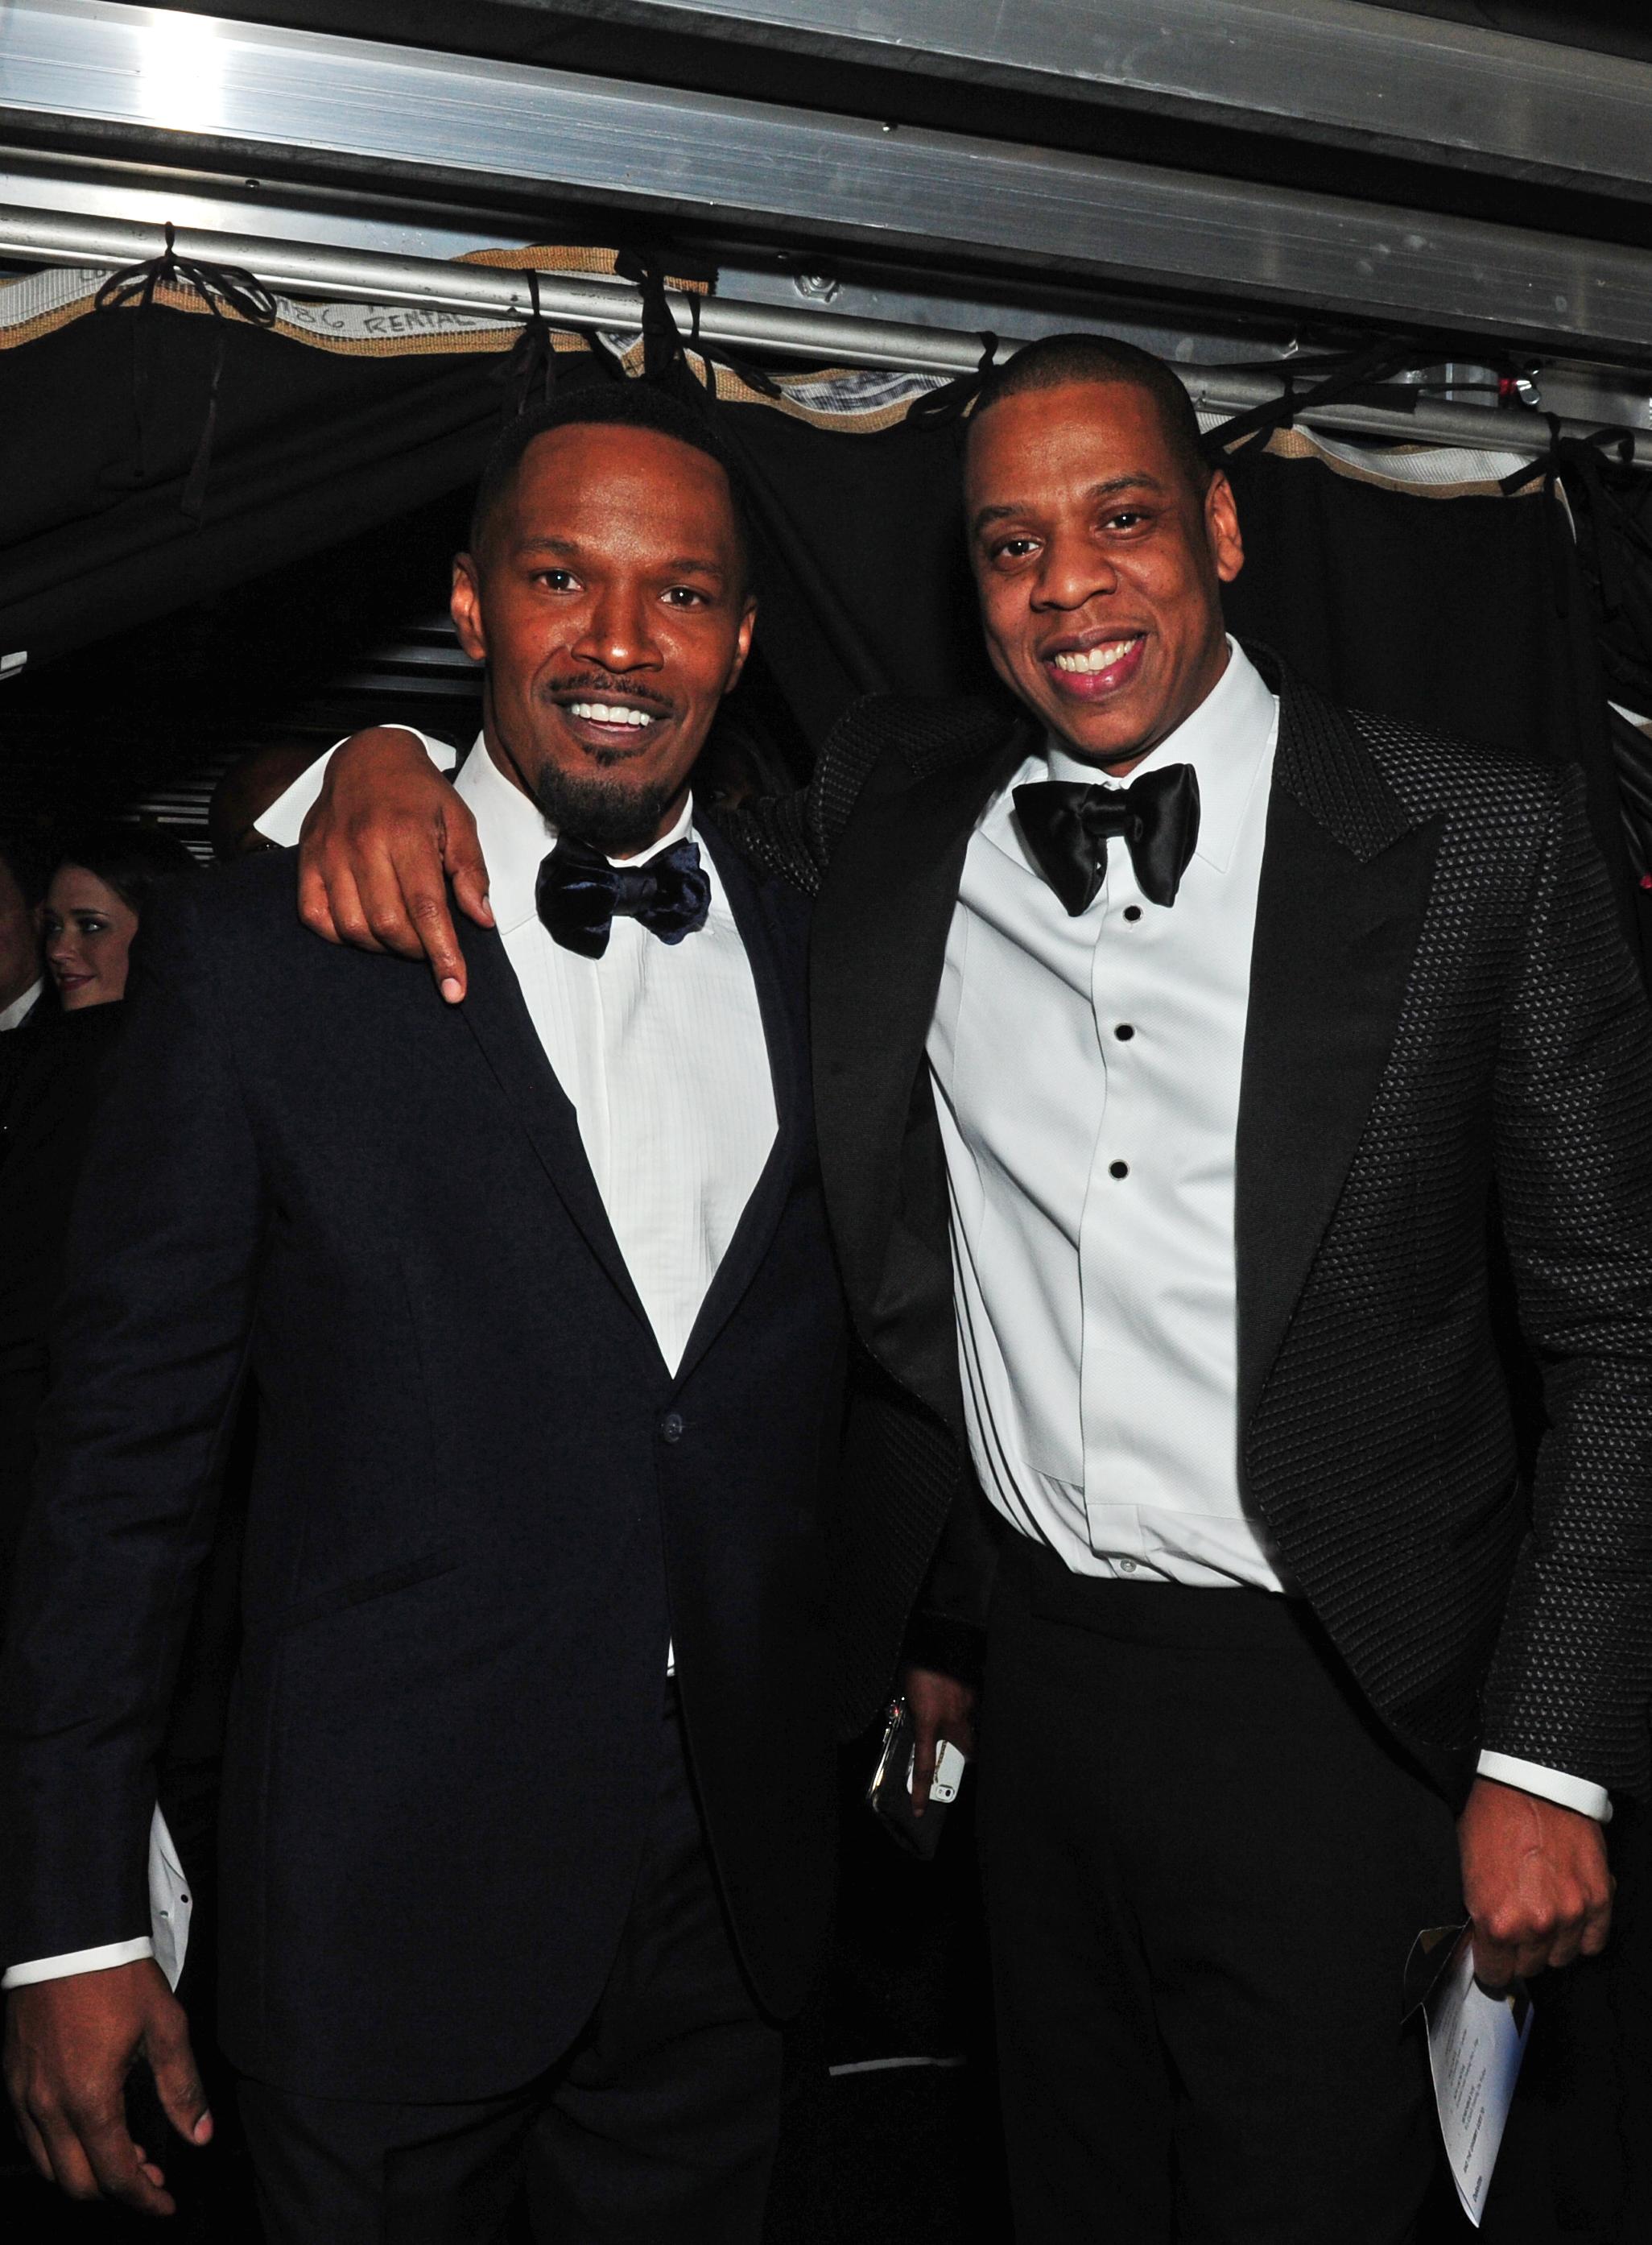 Jaime Foxx and Jay Z - GRAMMYs 2014 - CBS.com